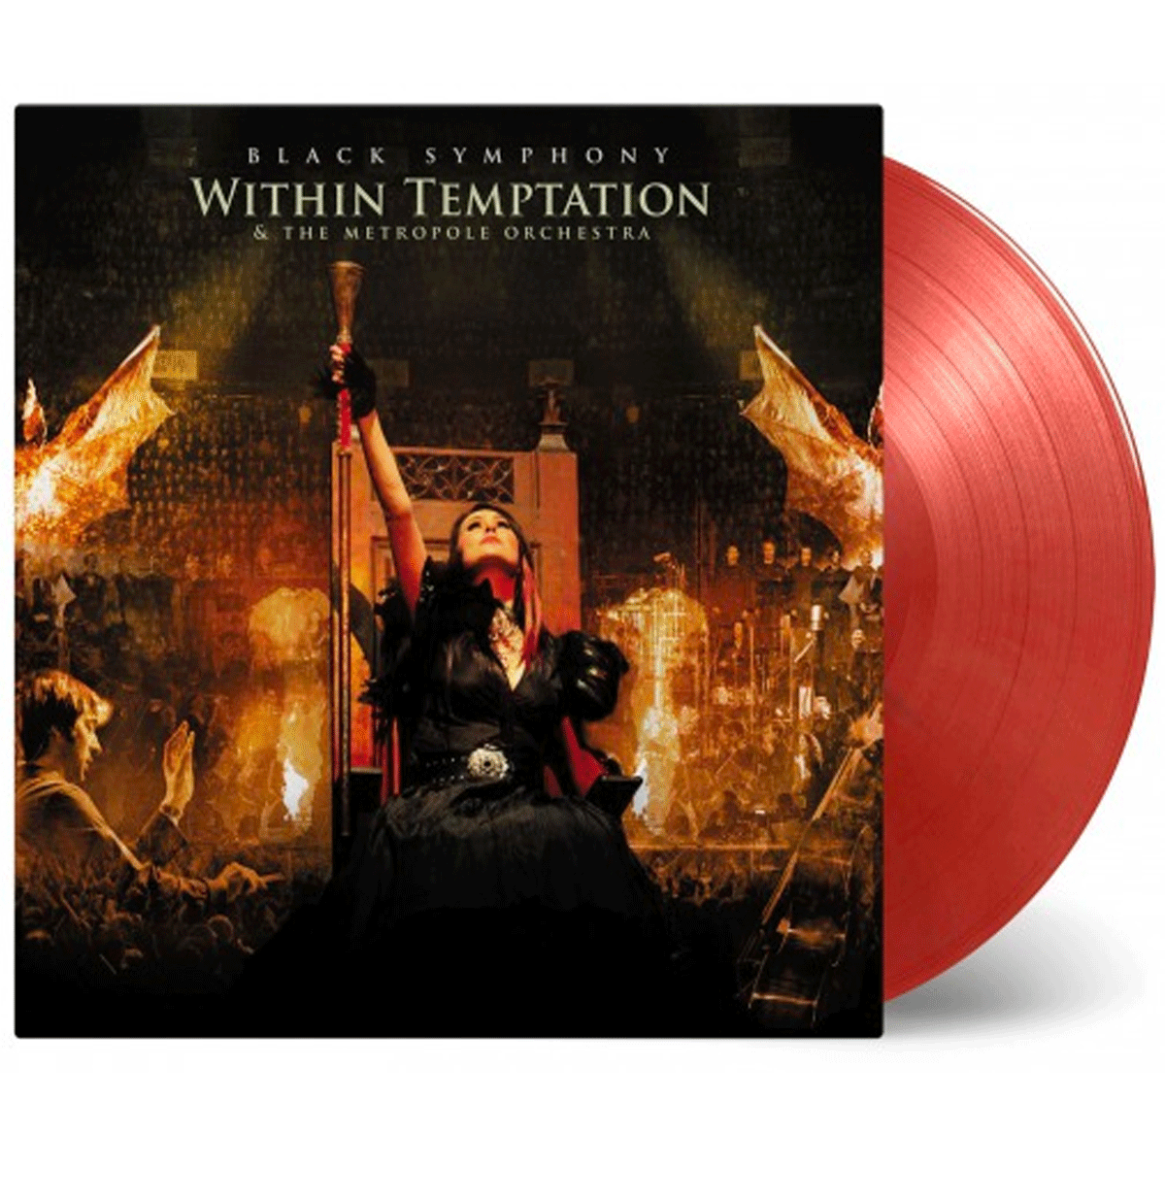 Within Temptation & The Metropole Orchestra - Black Symphony 3 LP Gelimiteerde Editie